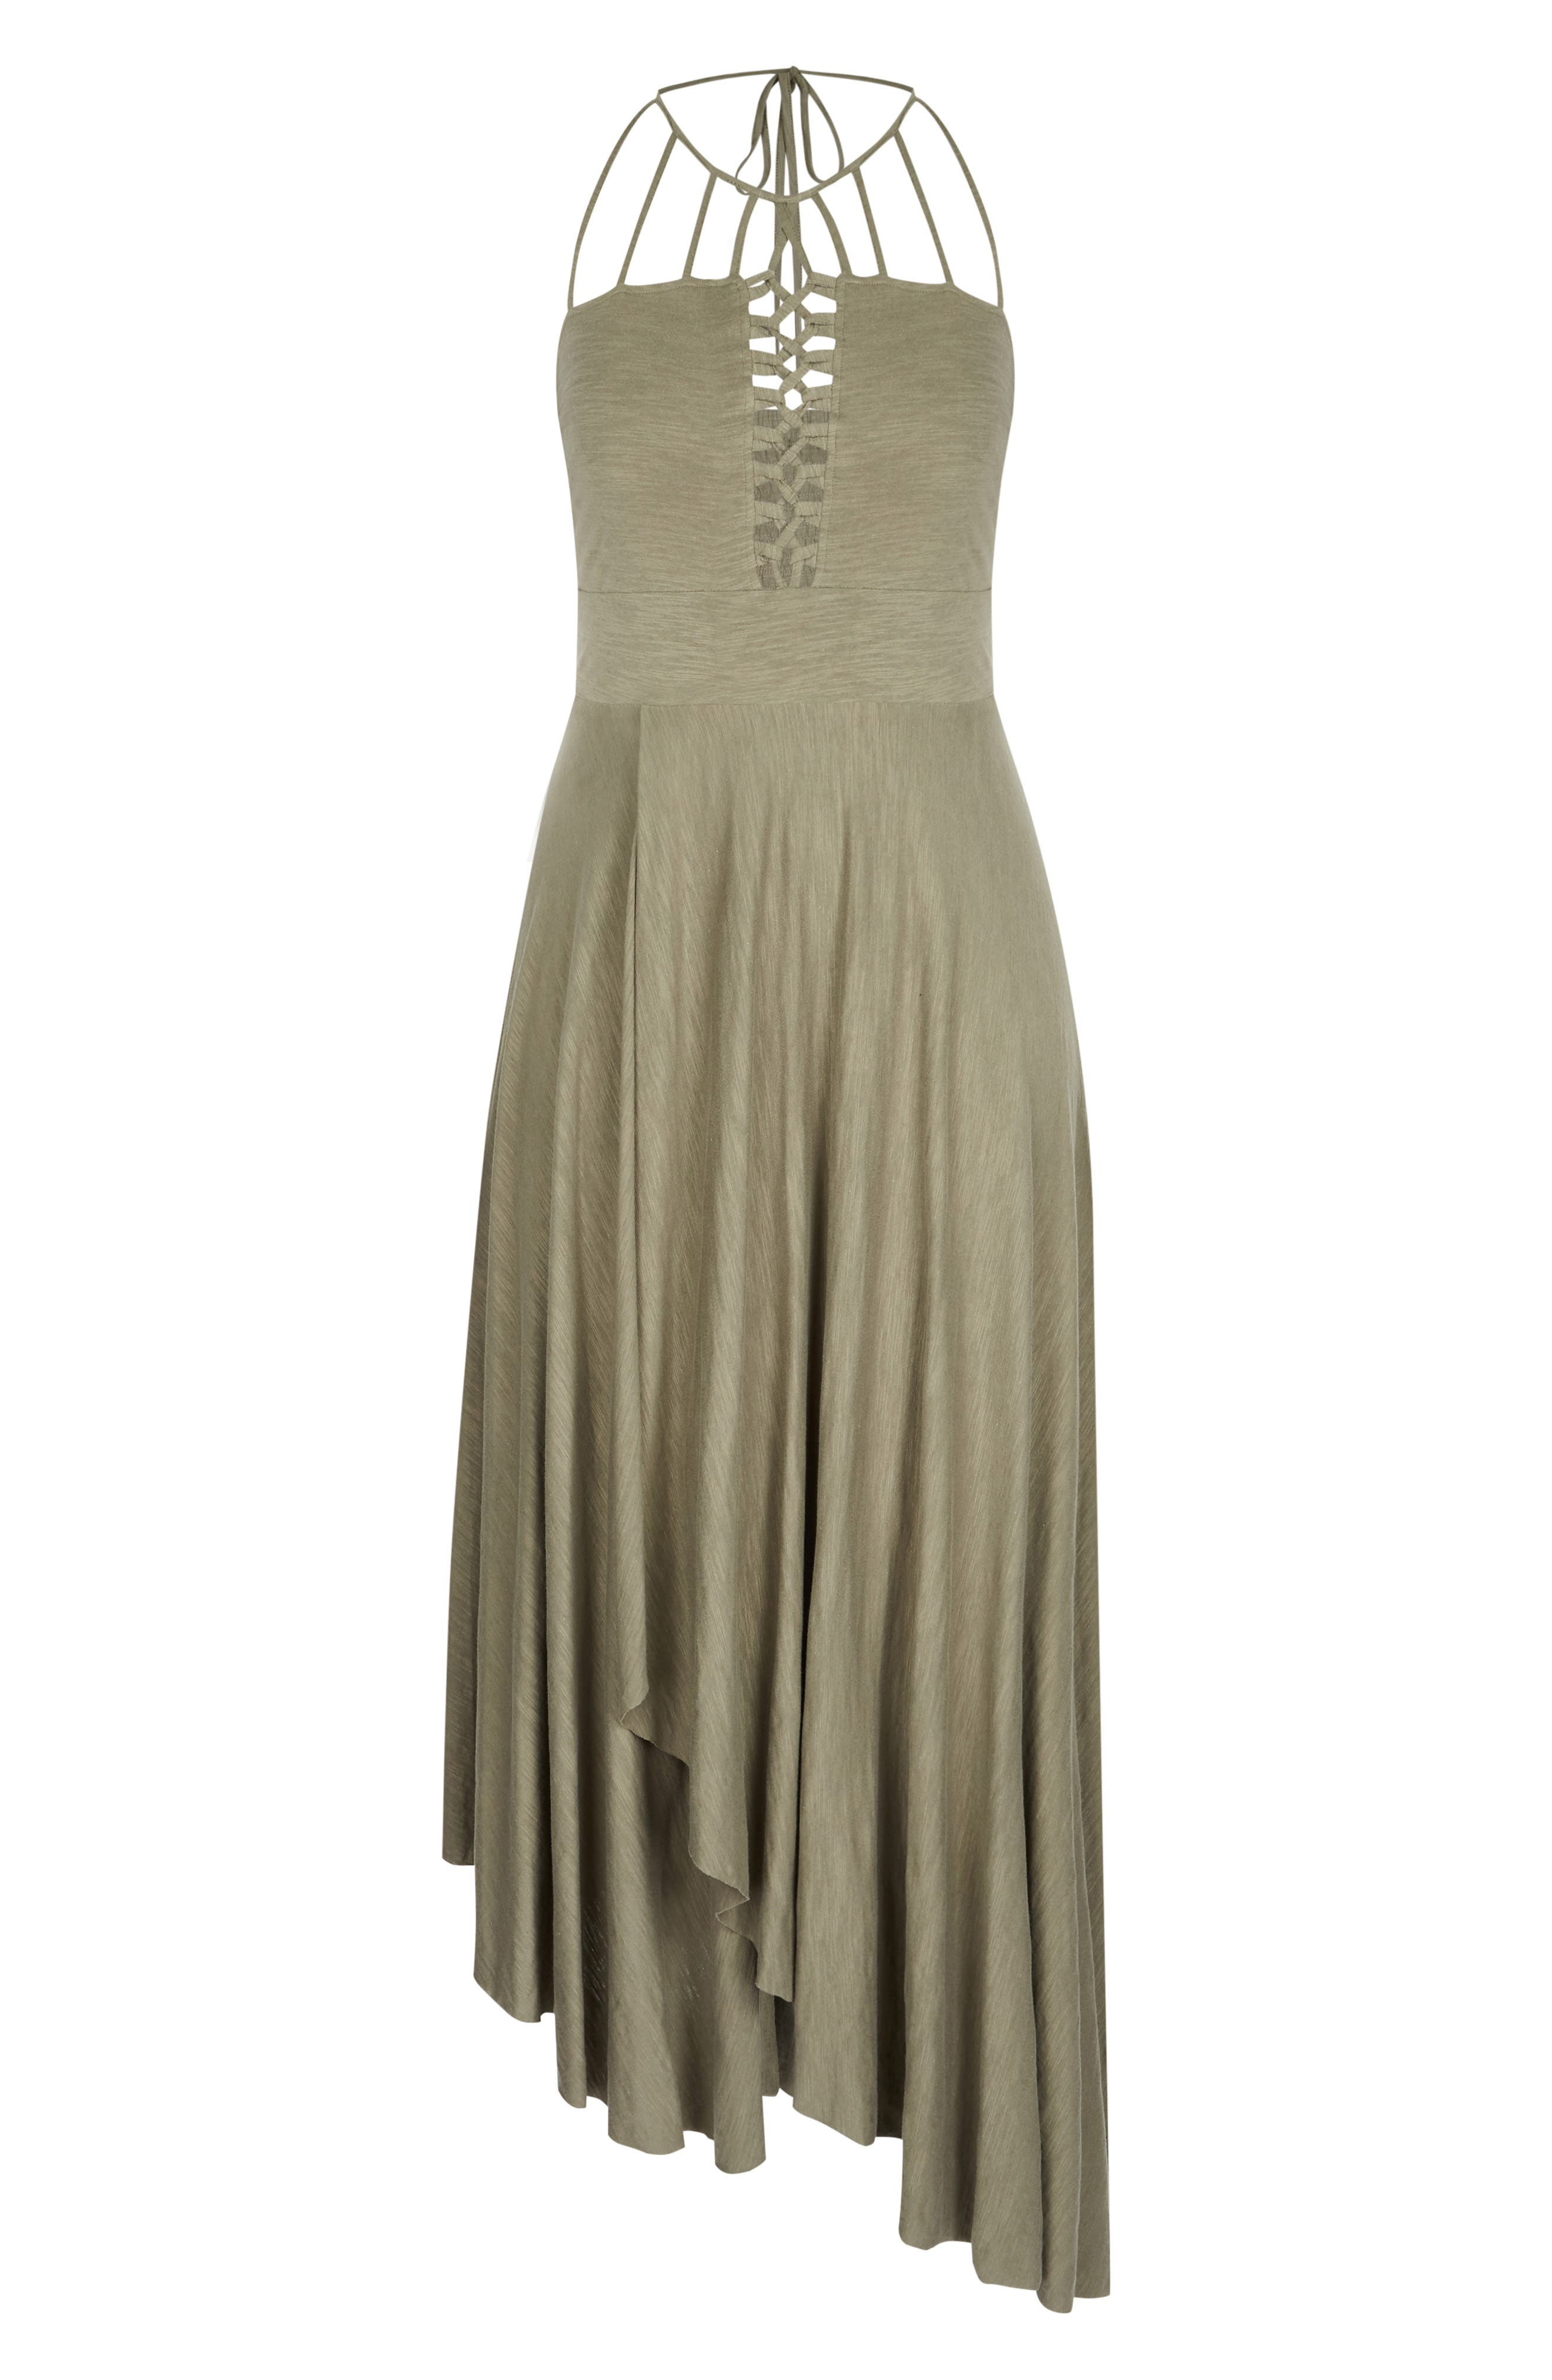 CITY CHIC, Strappy Asymmetrical Faux Wrap Halter Maxi Dress, Alternate thumbnail 3, color, KHAKI